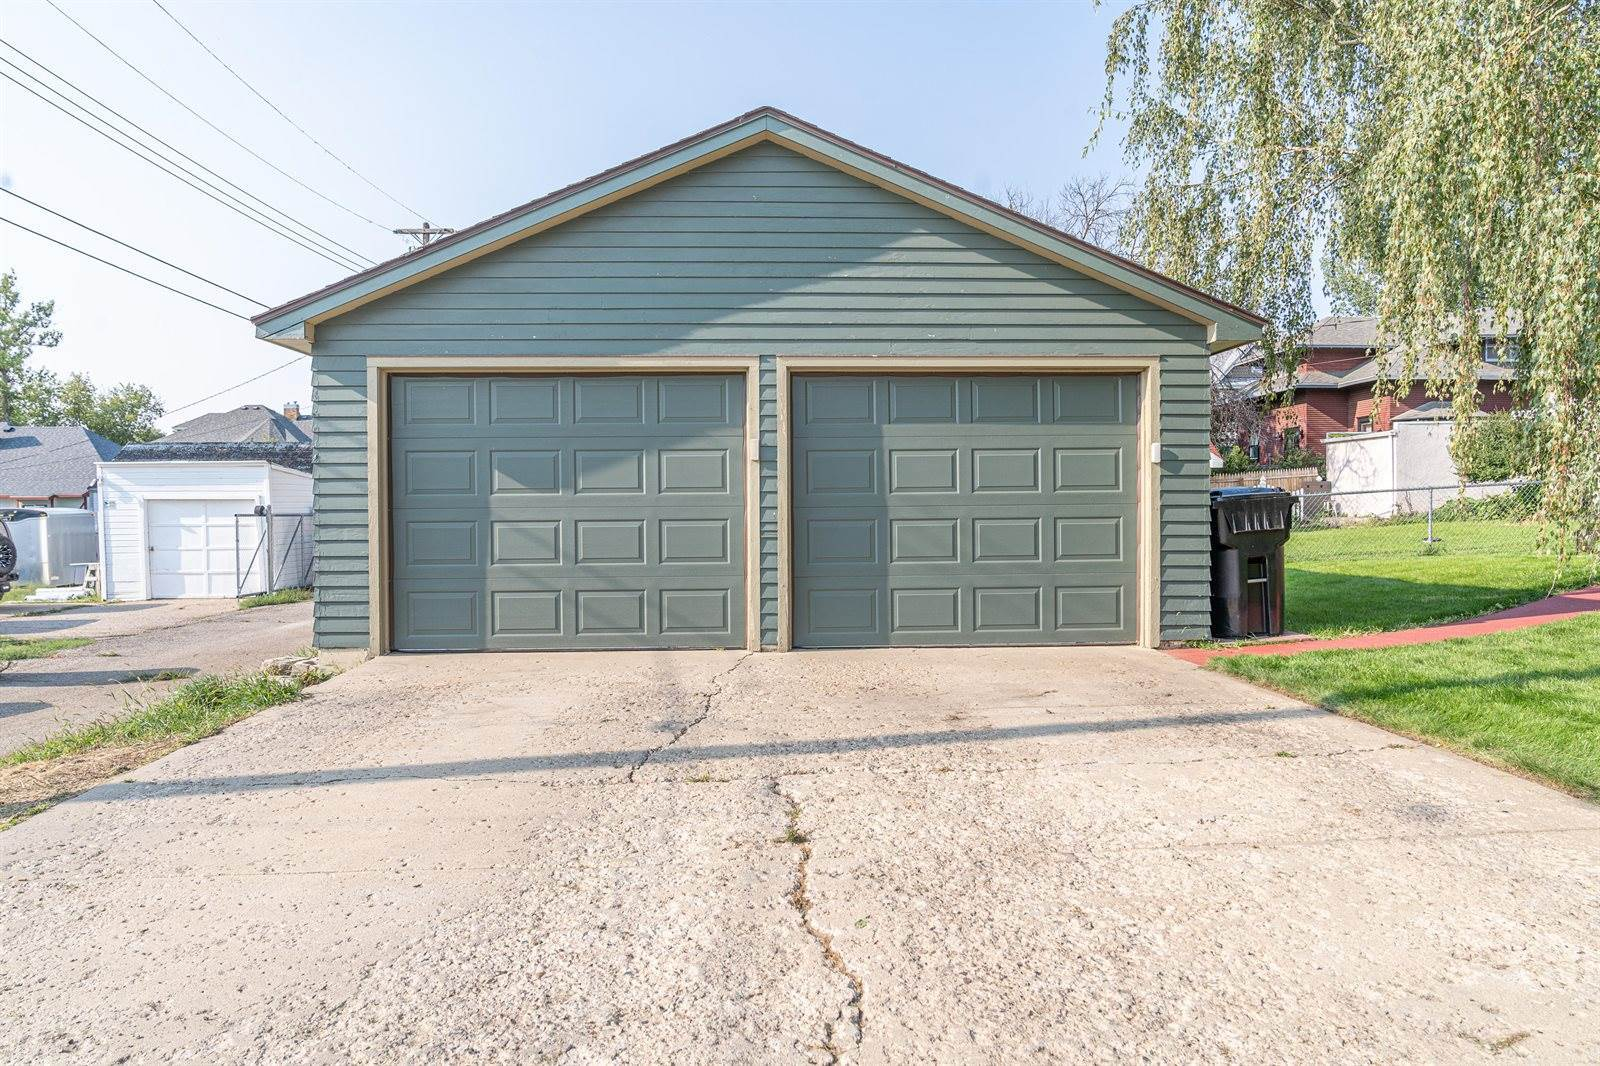 803 1st Ave East, Williston, ND 58801